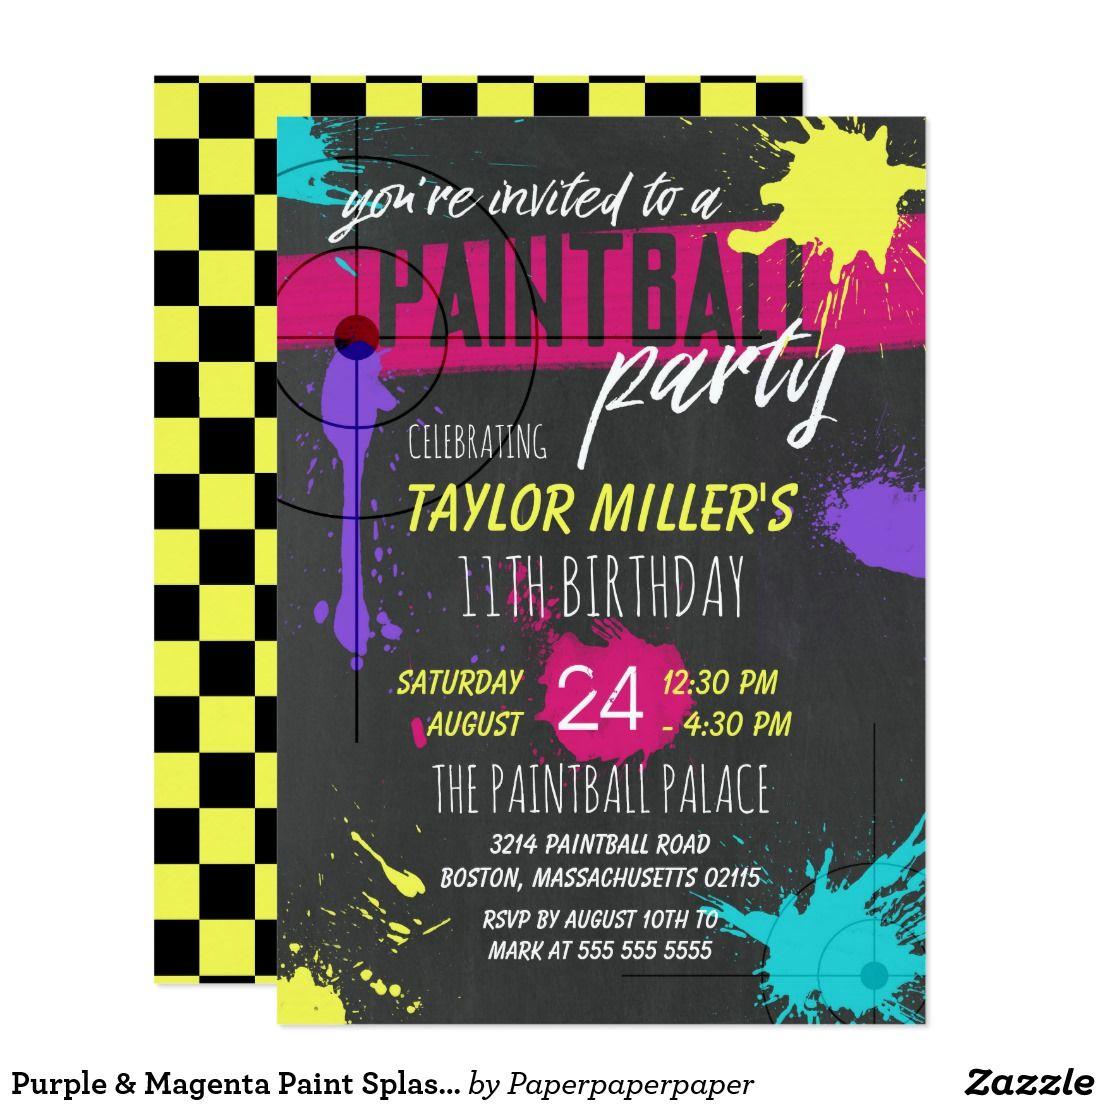 Purple & Magenta Paint Splash Paintball Party Invitation | Zazzle ...